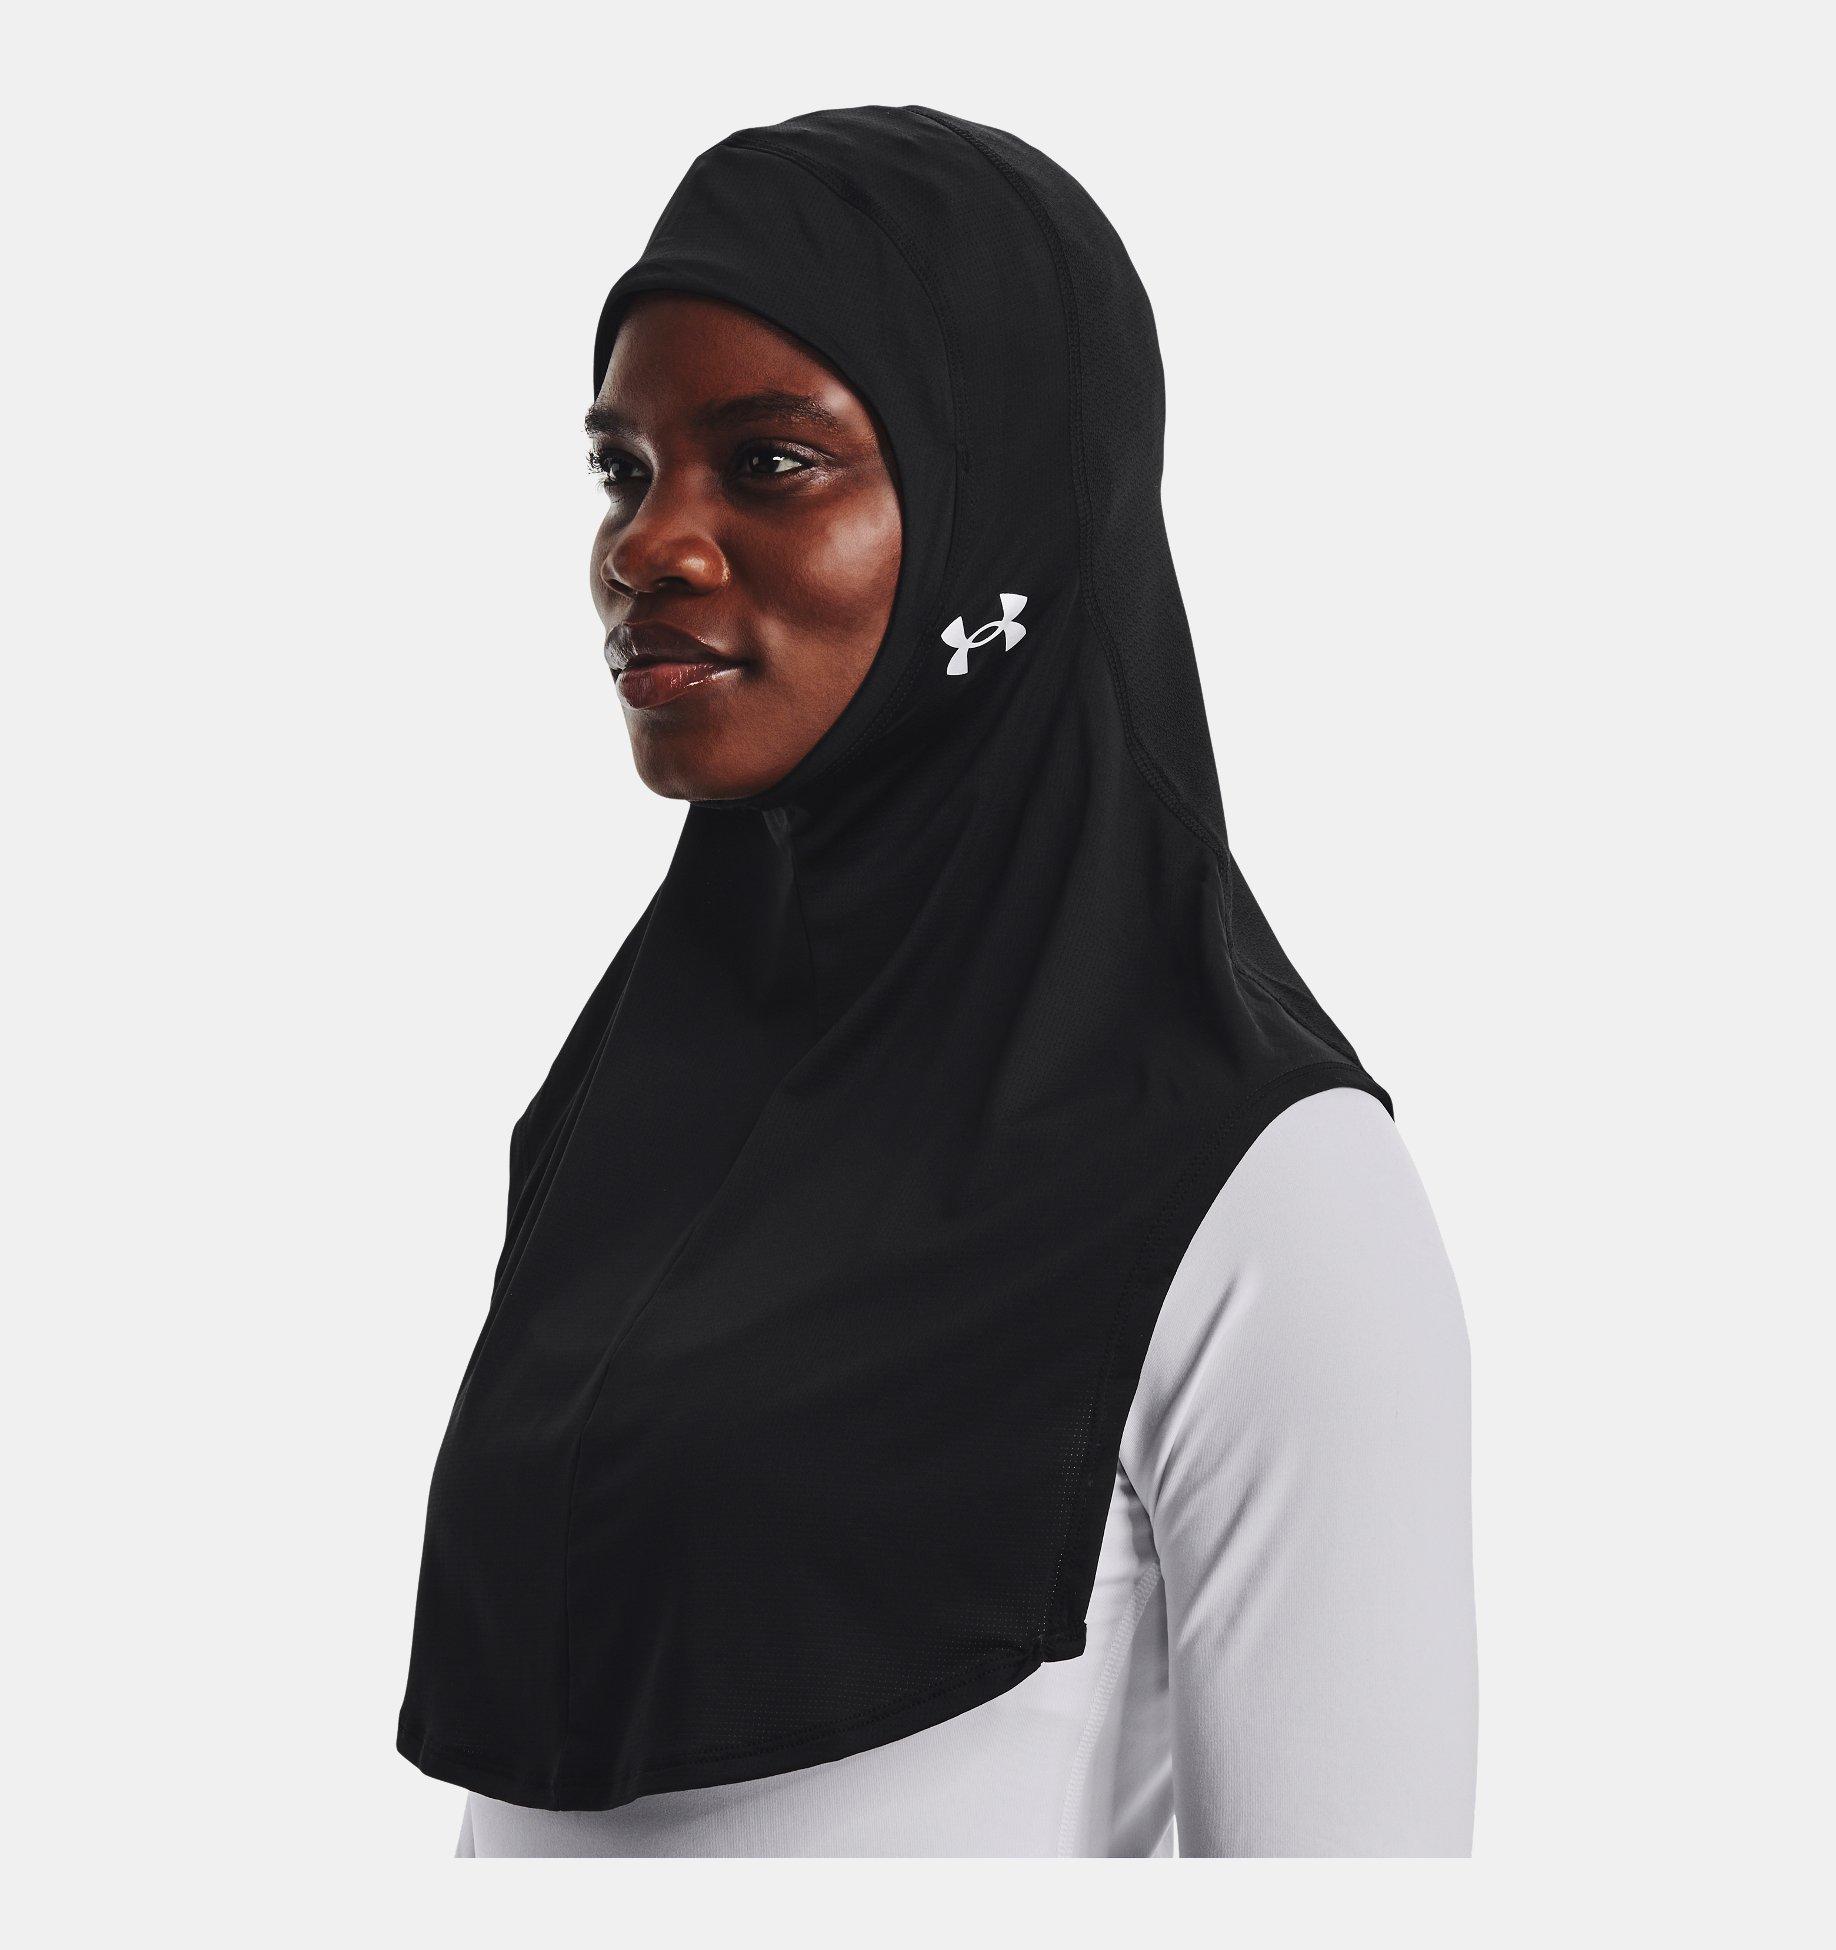 Underarmour Womens UA Extended Sport Hijab